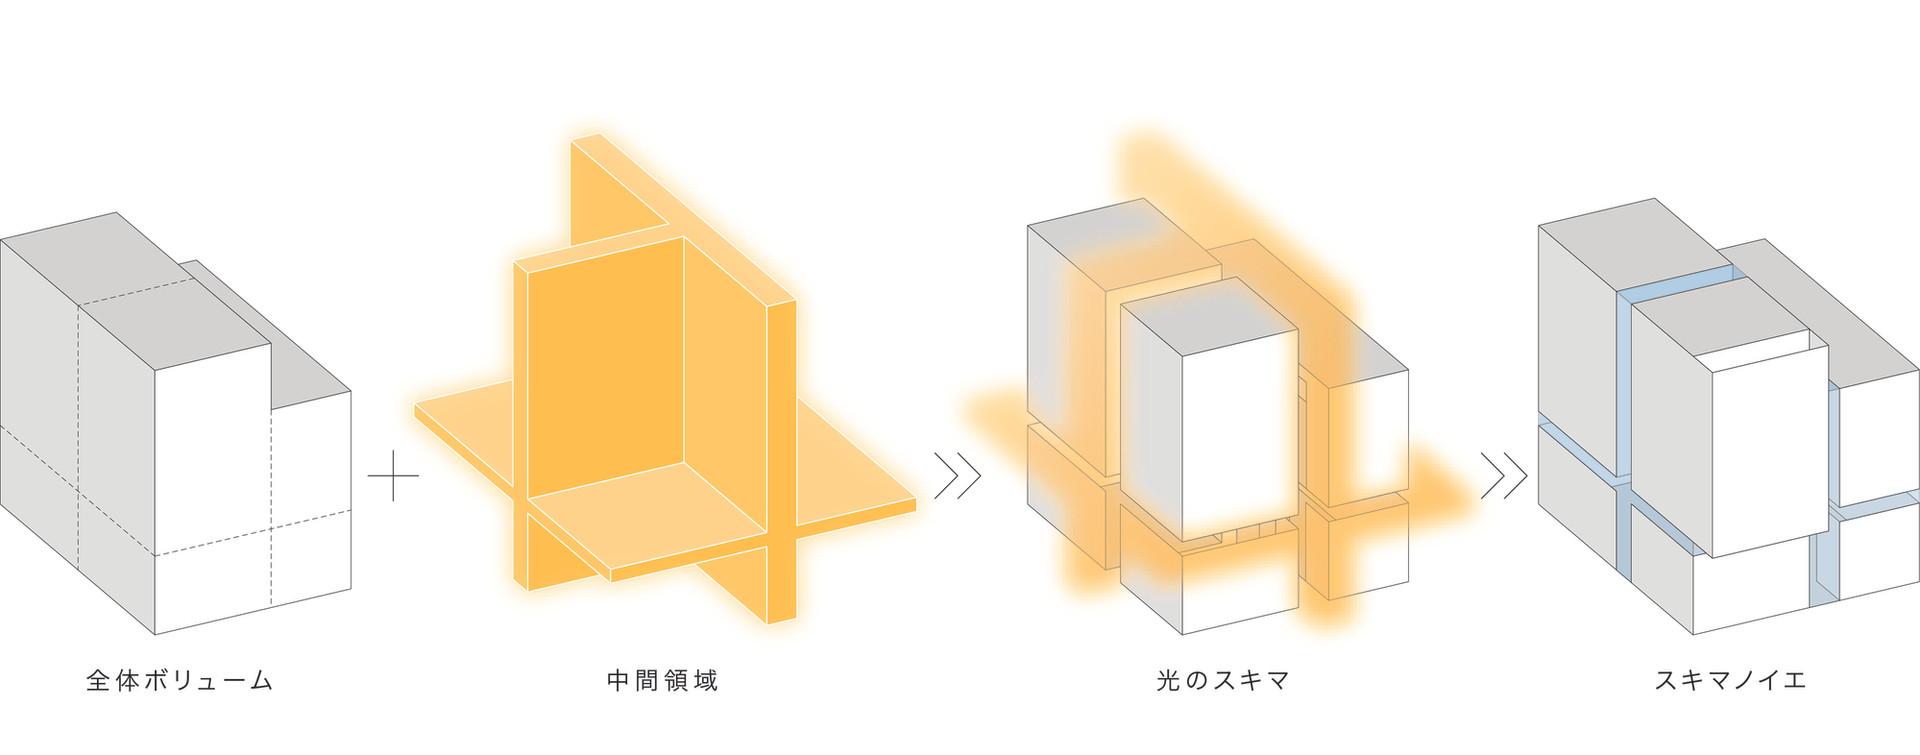 diagram120118+.jpg